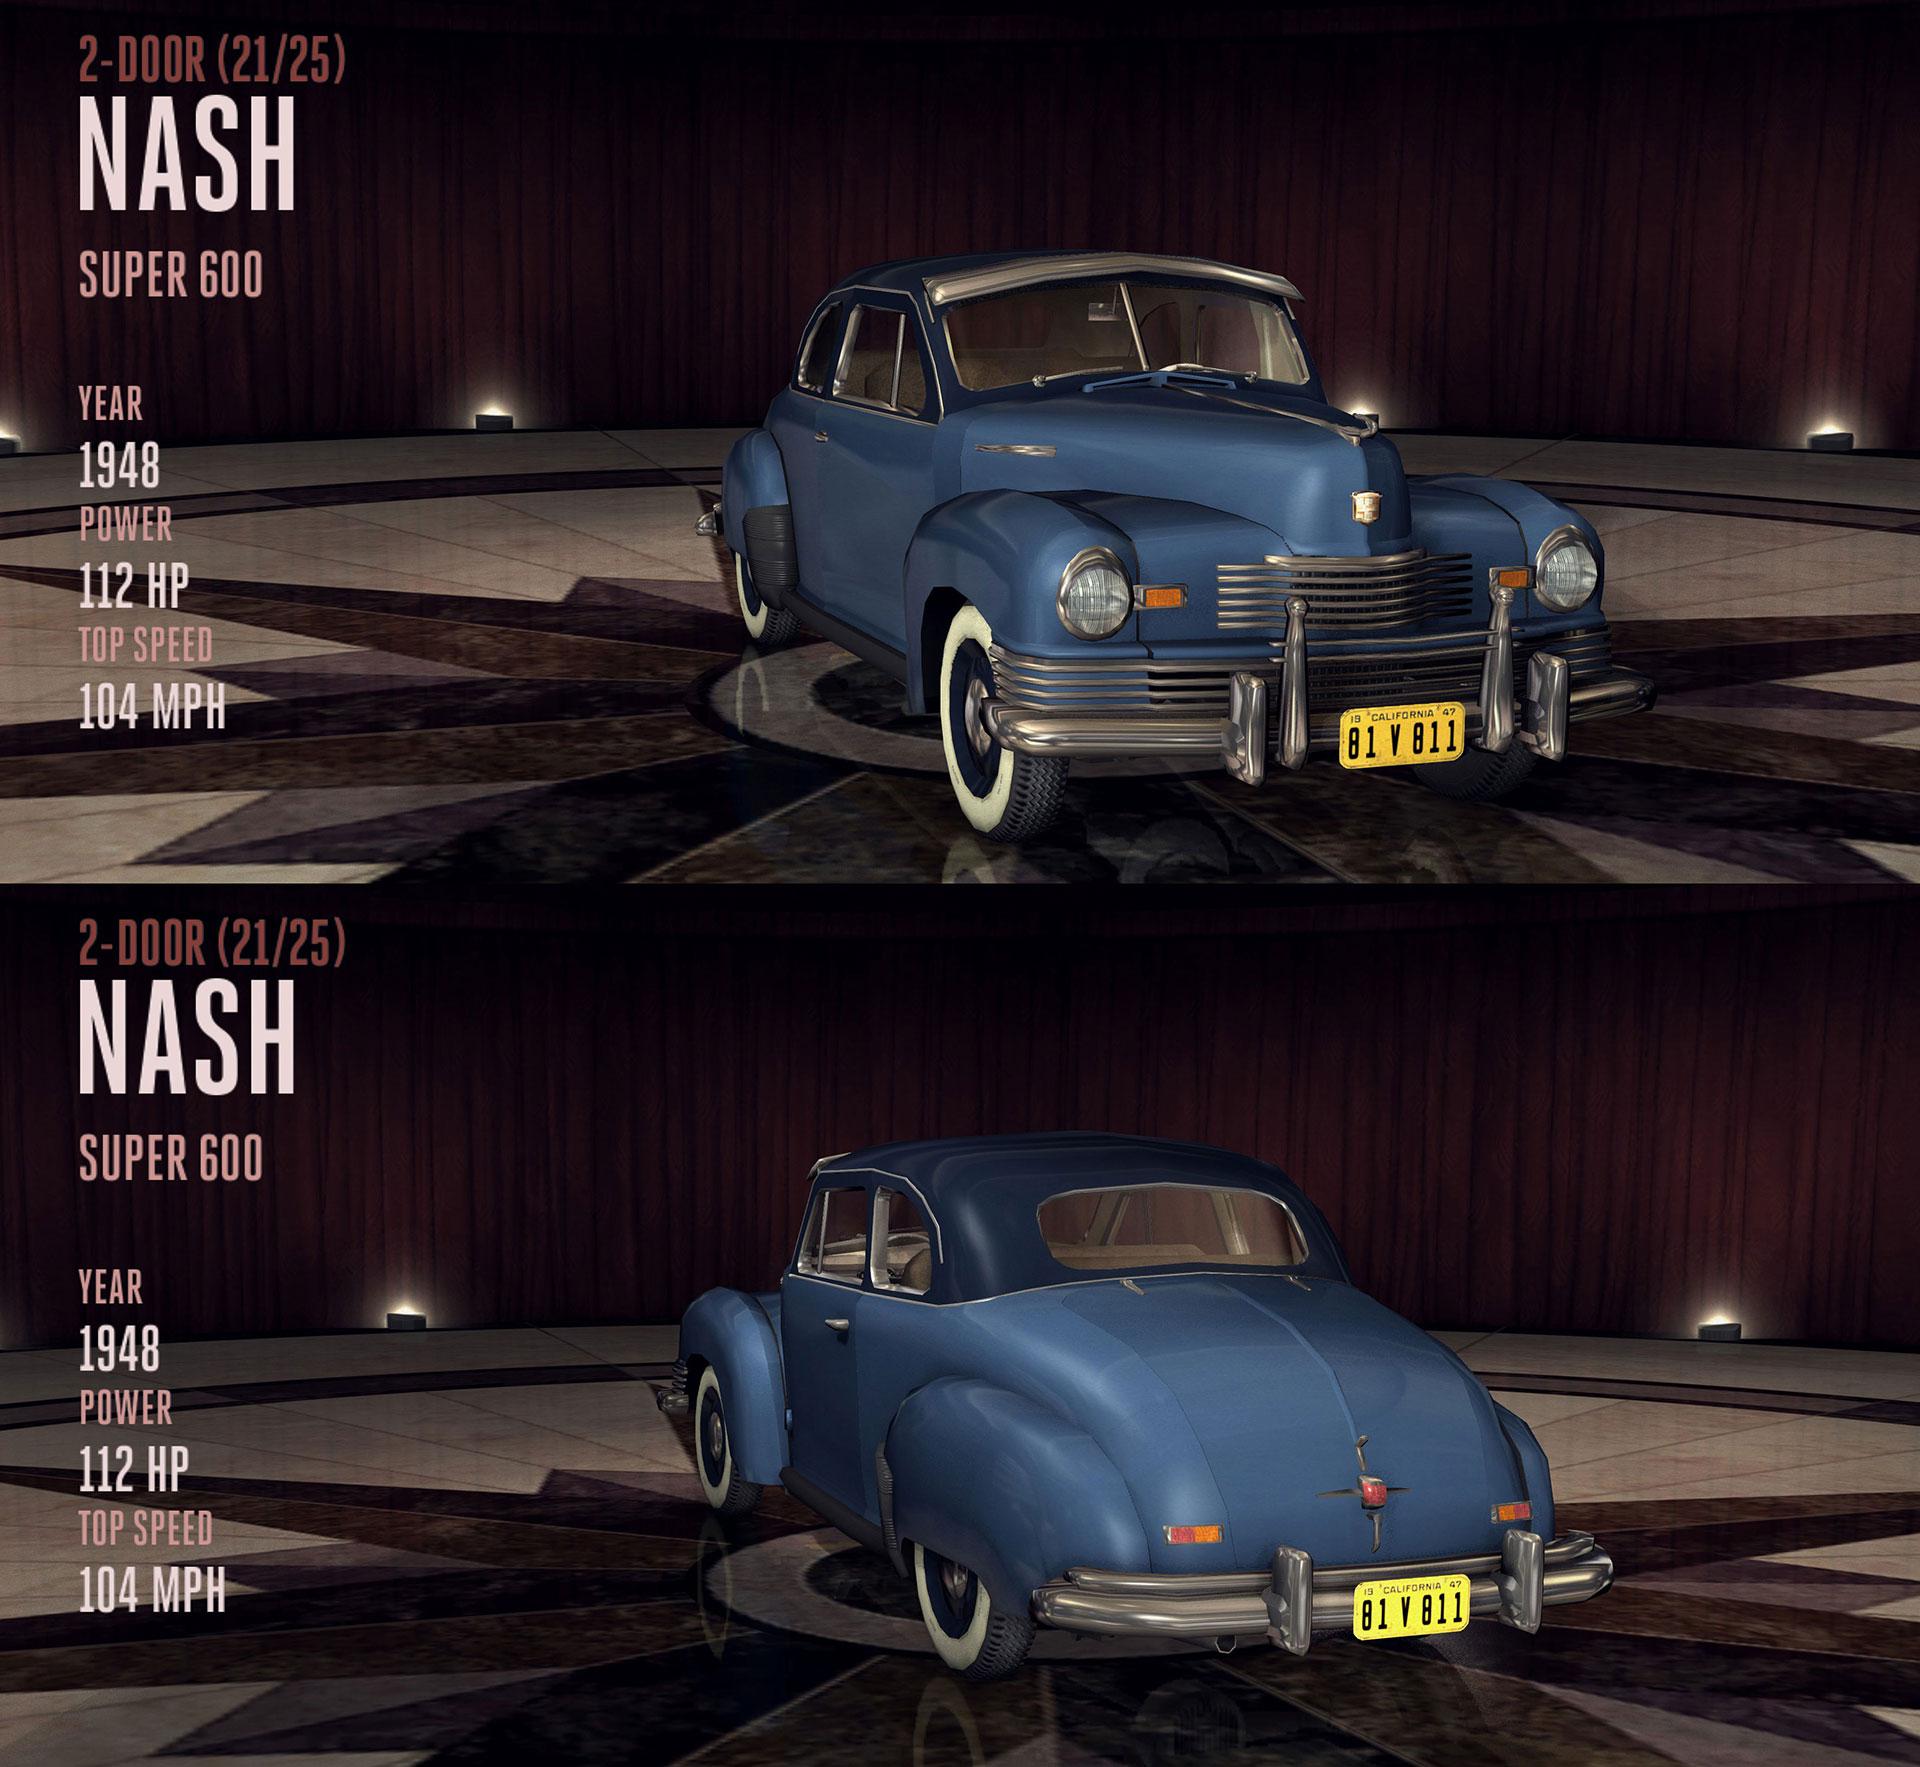 Archivo:1948-nash-super-600.jpg